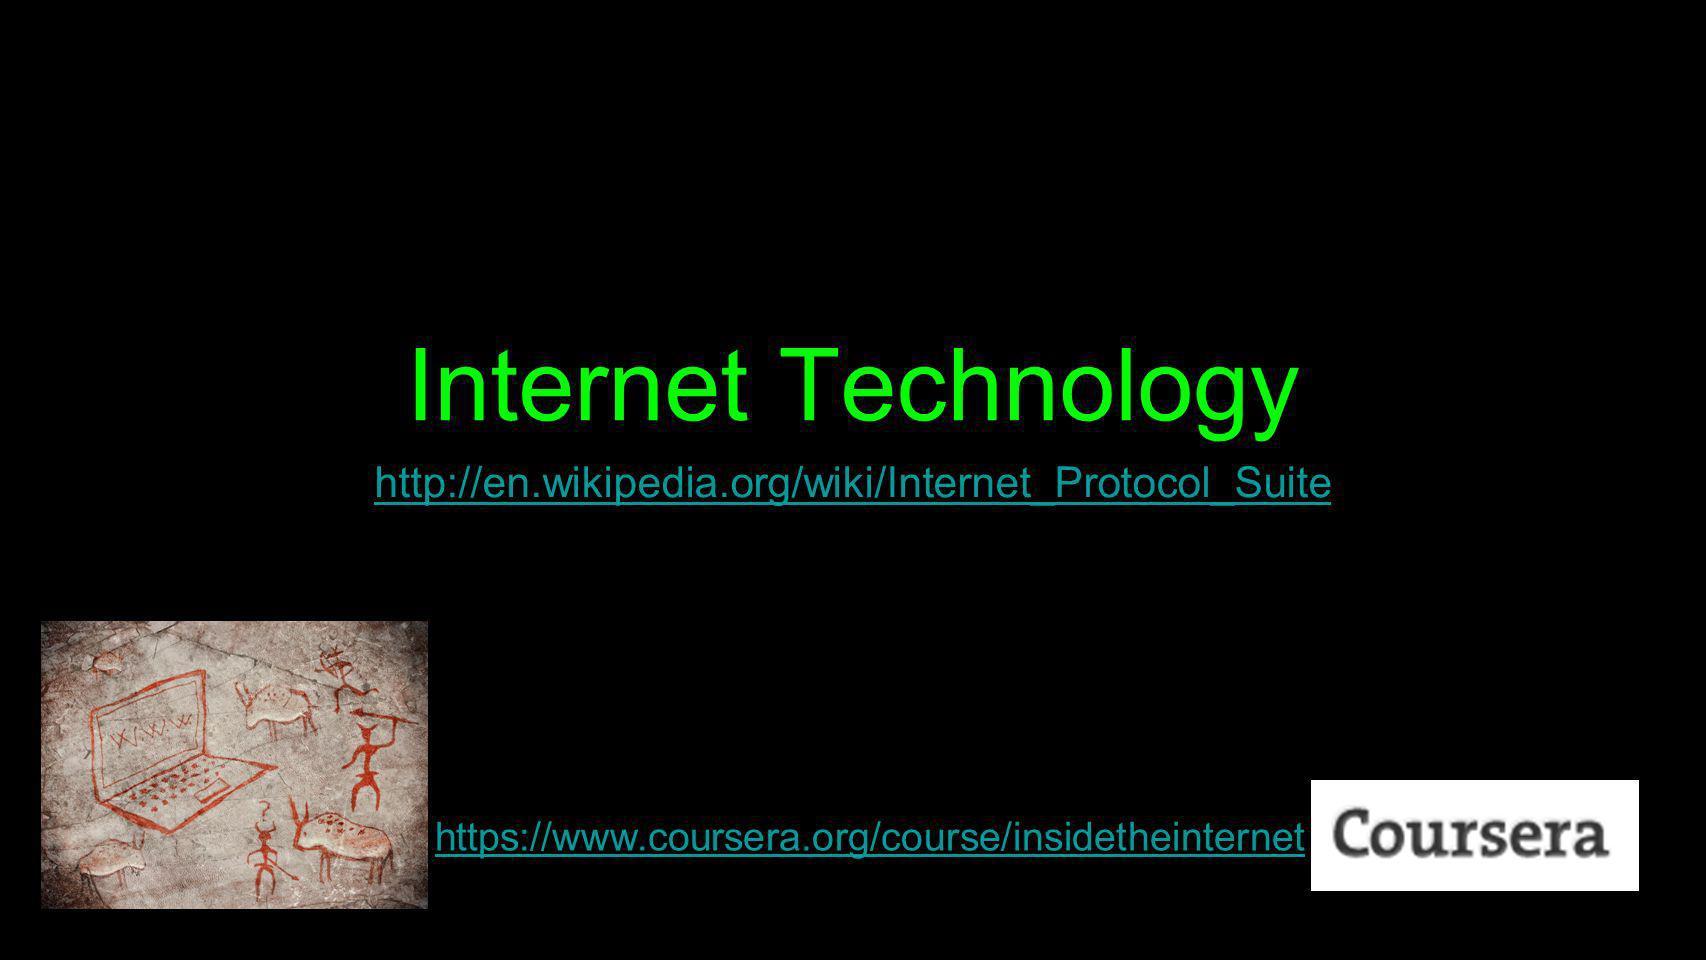 Internet Technology http://en.wikipedia.org/wiki/Internet_Protocol_Suite https://www.coursera.org/course/insidetheinternet